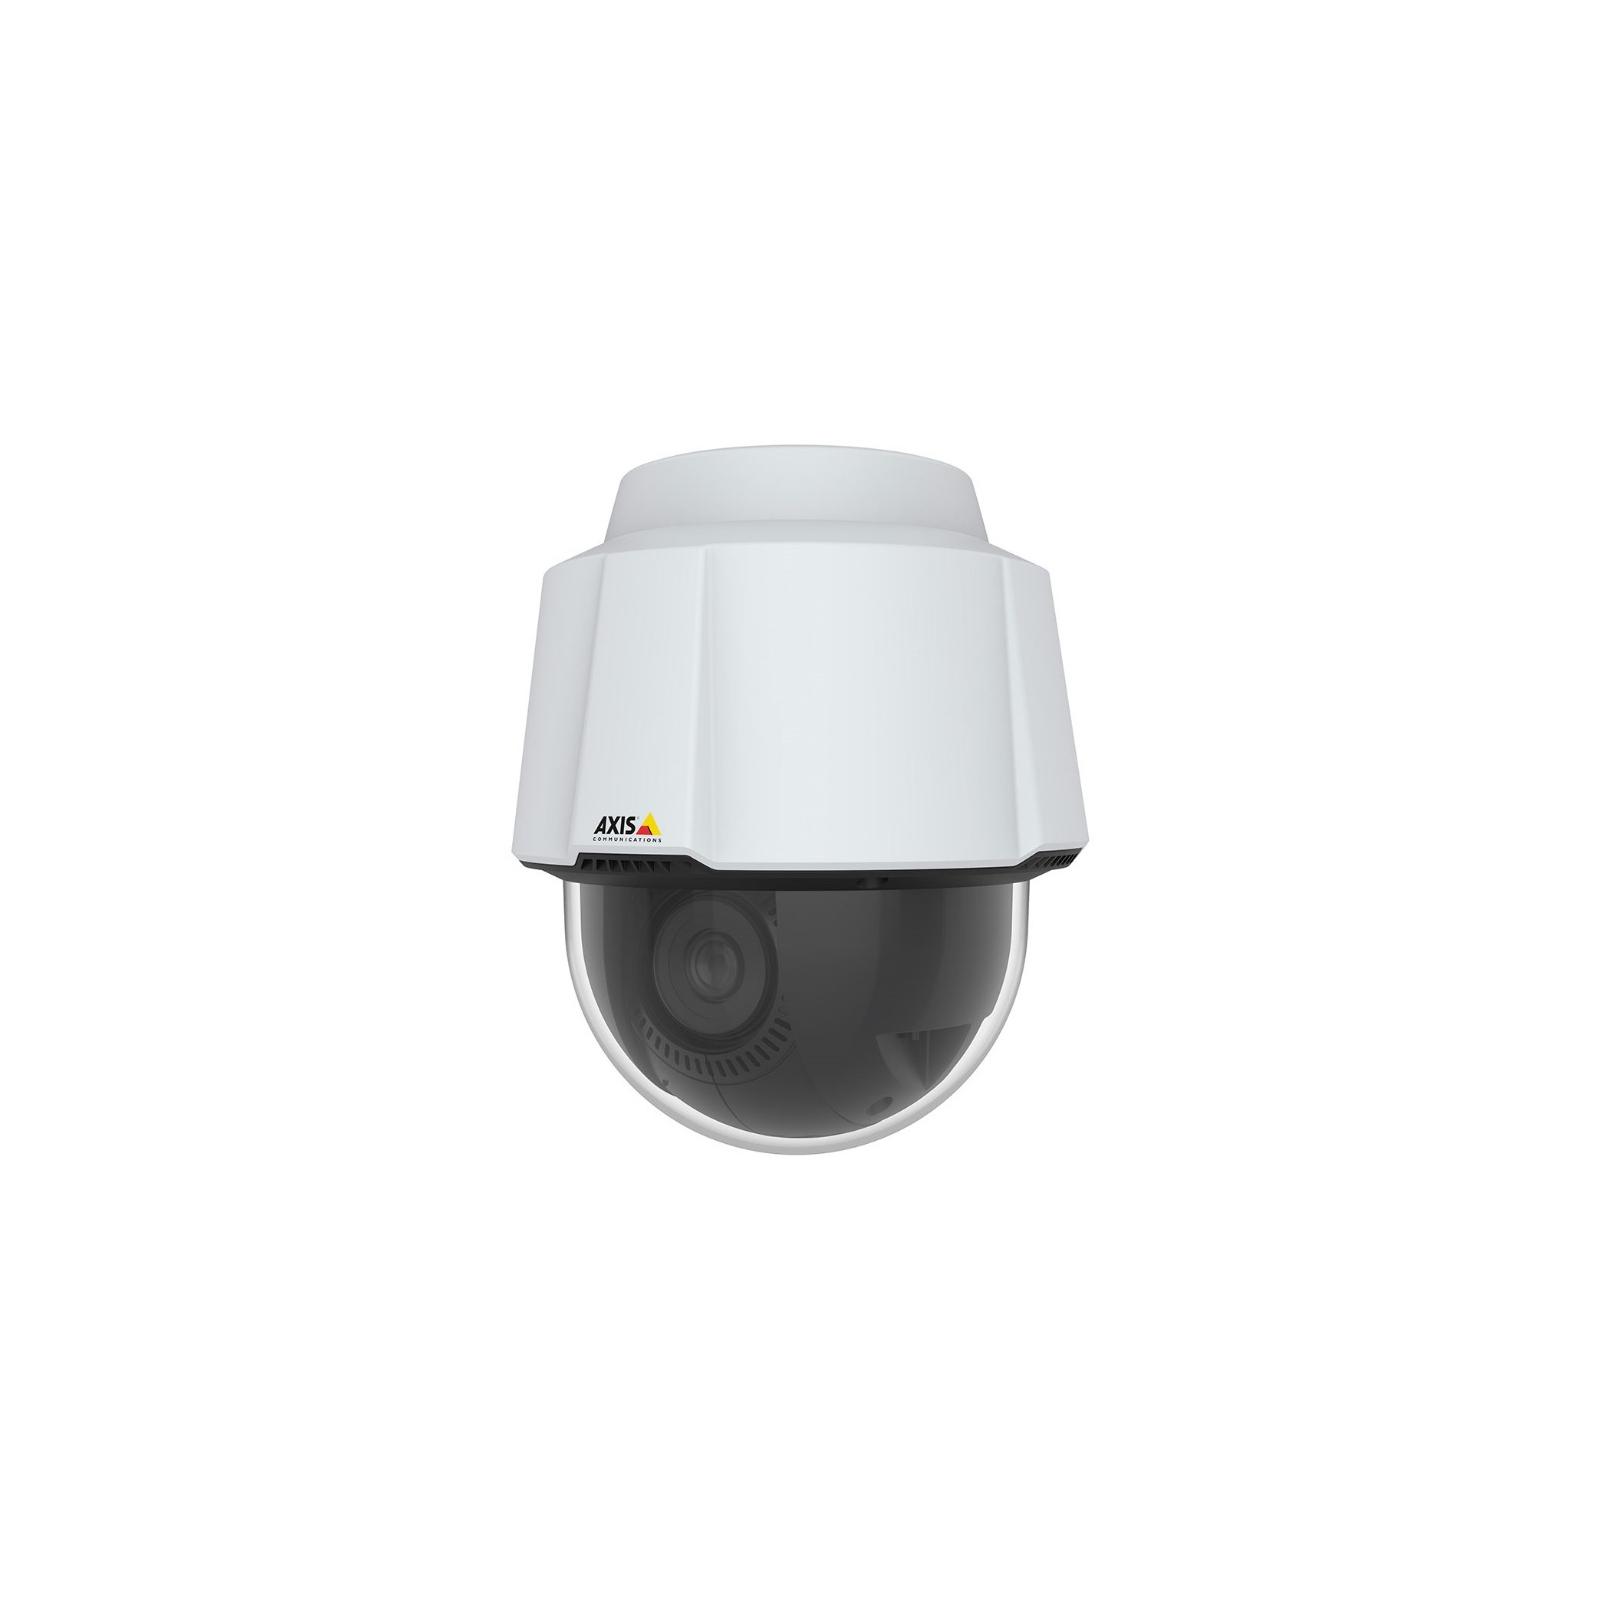 Камера видеонаблюдения Axis P5655-E 50HZ (PTZ 32x) (01681-001)